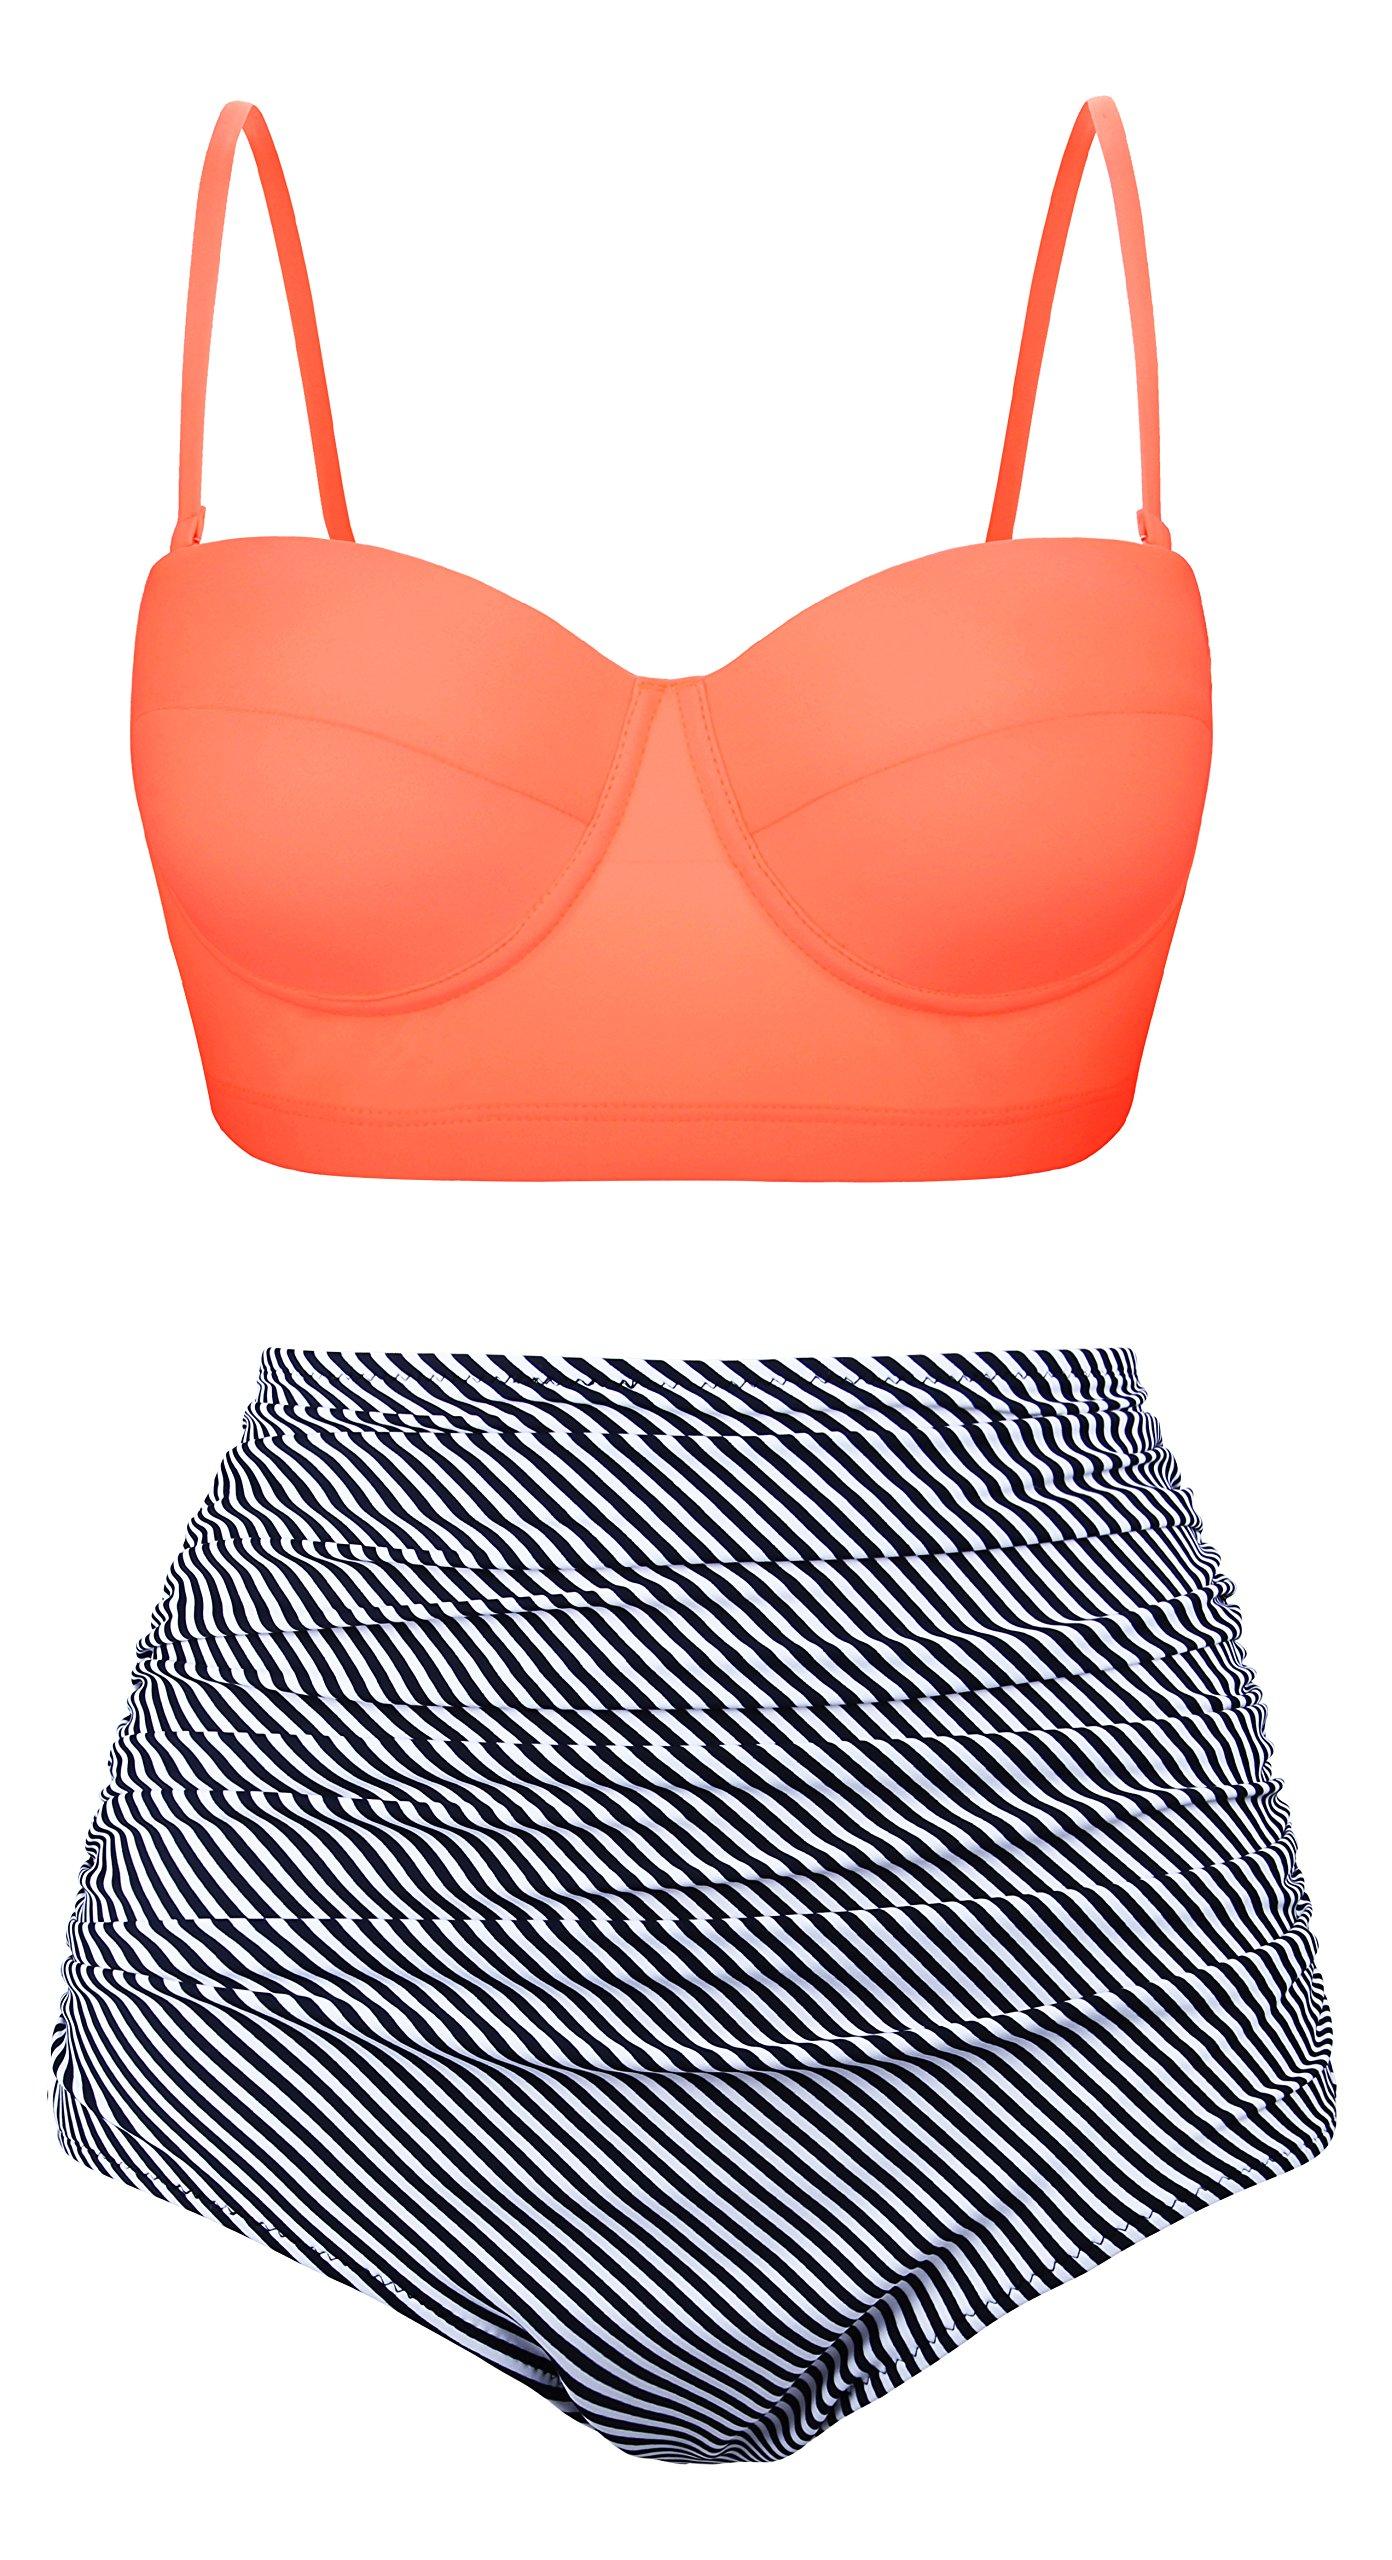 Aixy Women Vintage Swimsuits Bikinis Bathing Suits Retro Halter Underwired Top Orange Plus black US 14-16=Tag Size 4XL